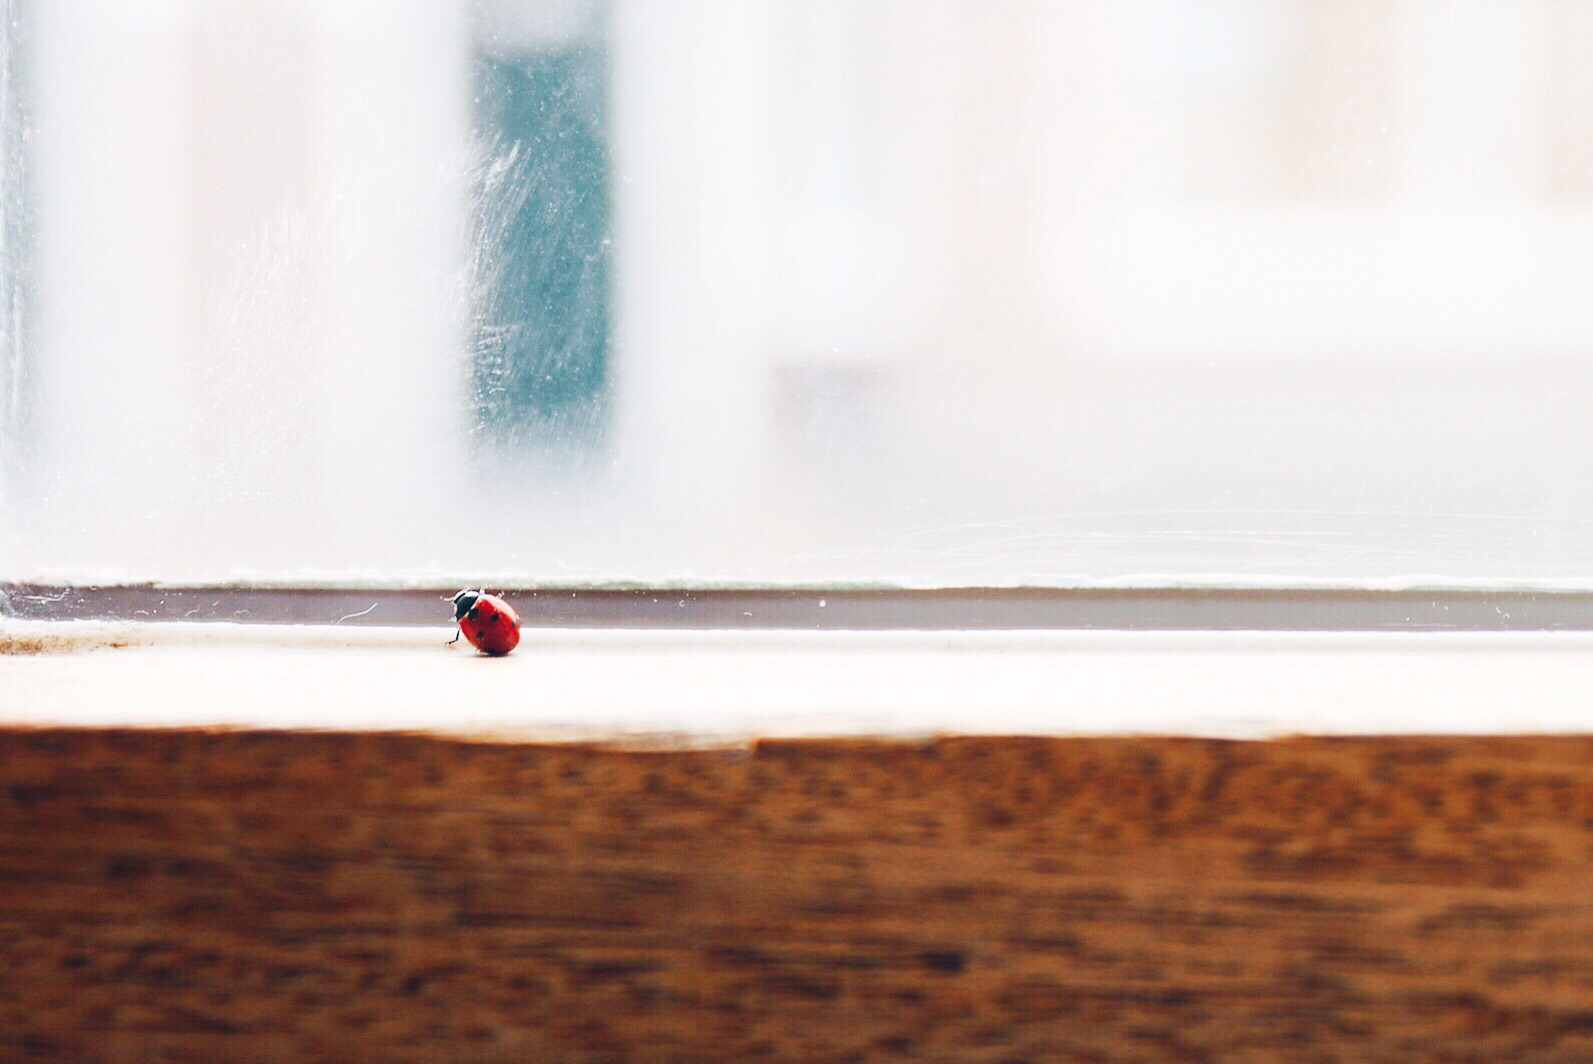 ladybug lessons